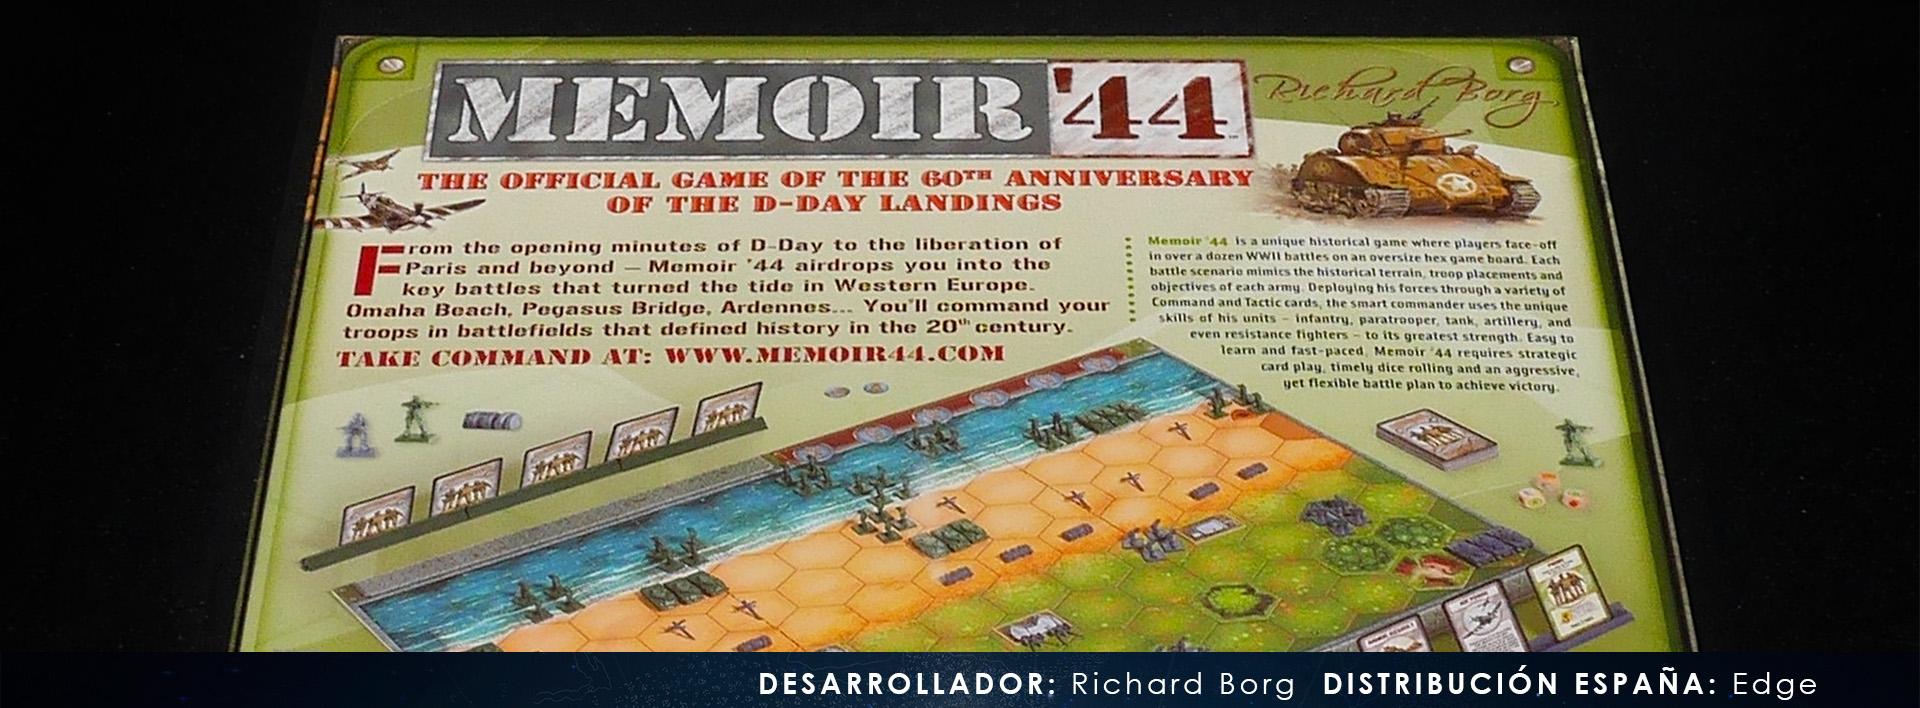 Momoir' 44 cab